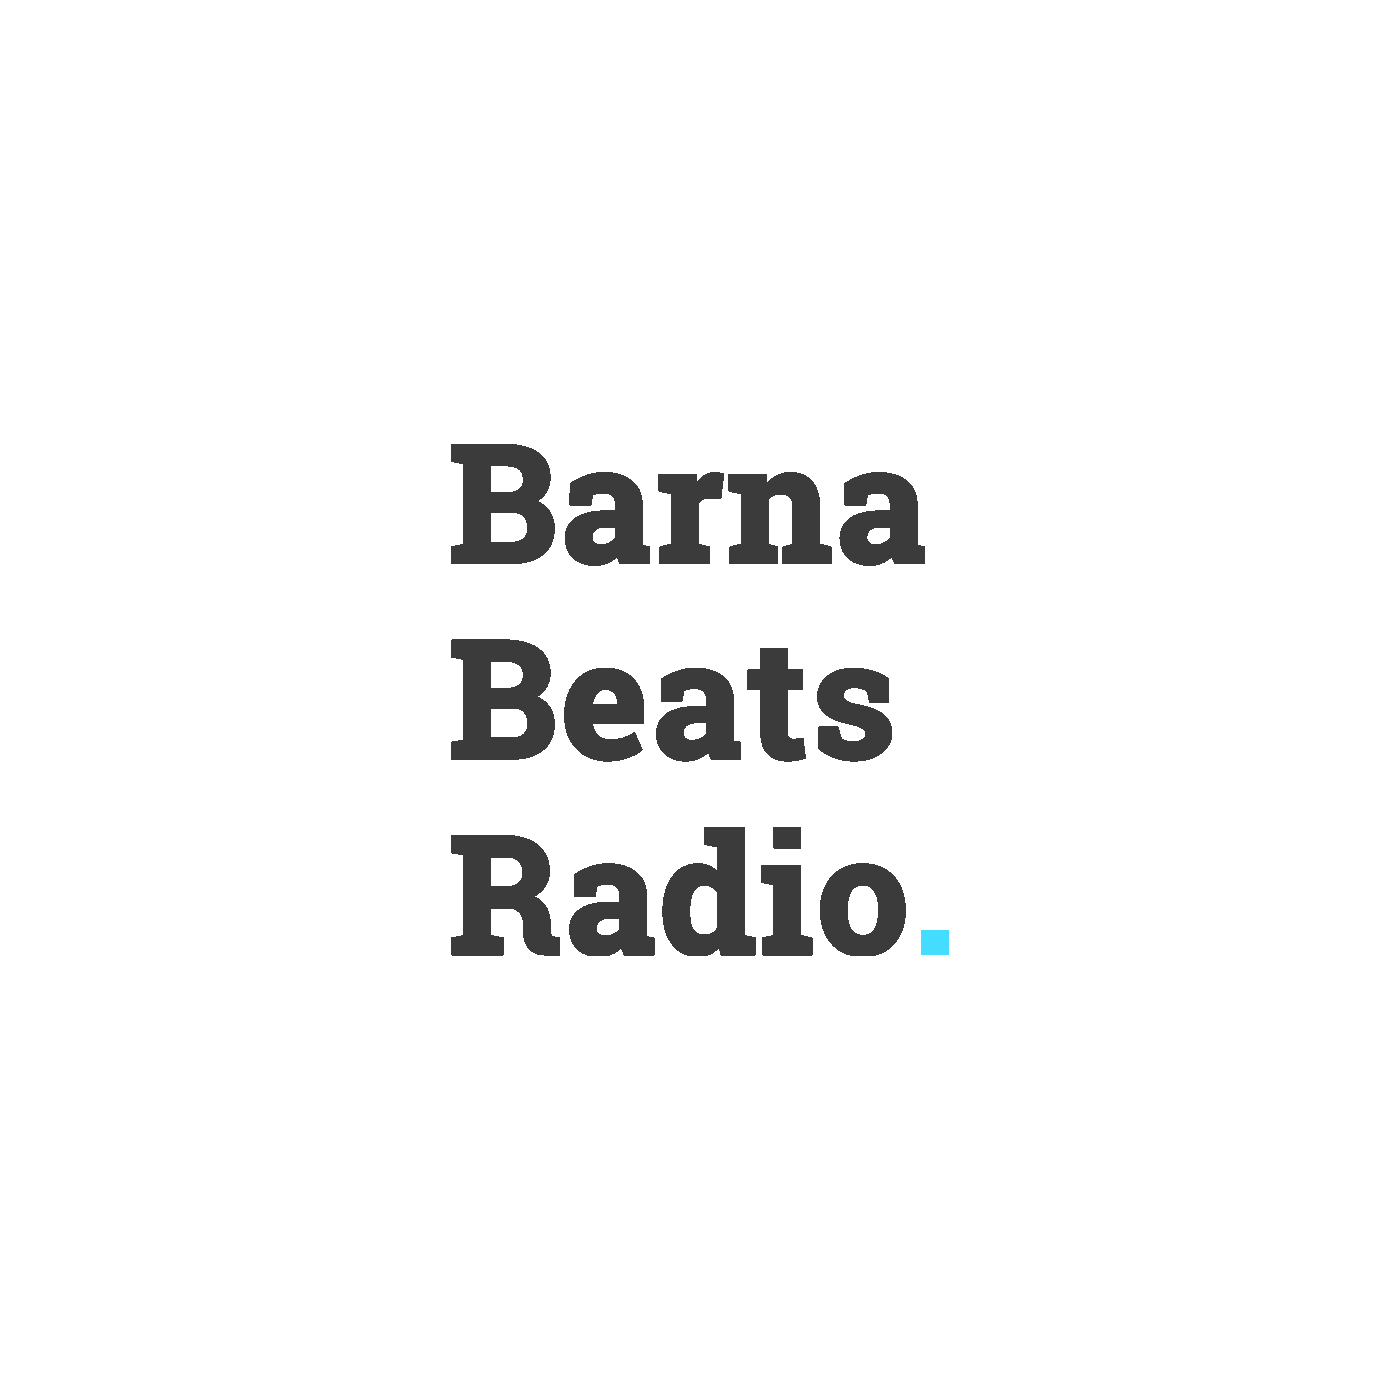 BarnaBeats Radio